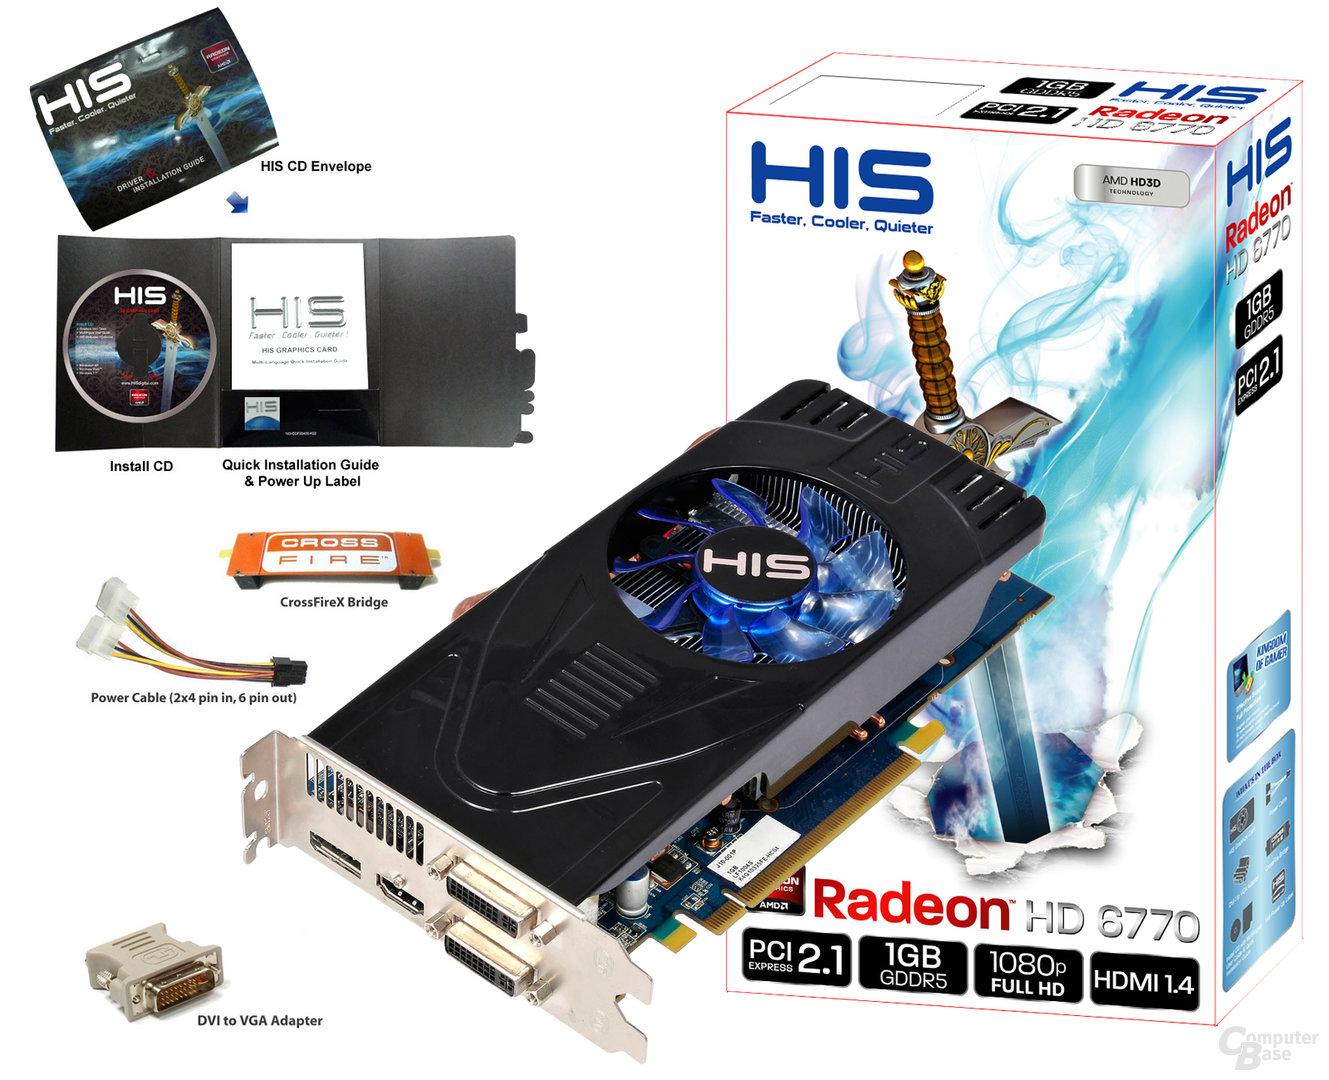 HIS Radeon HD 6770